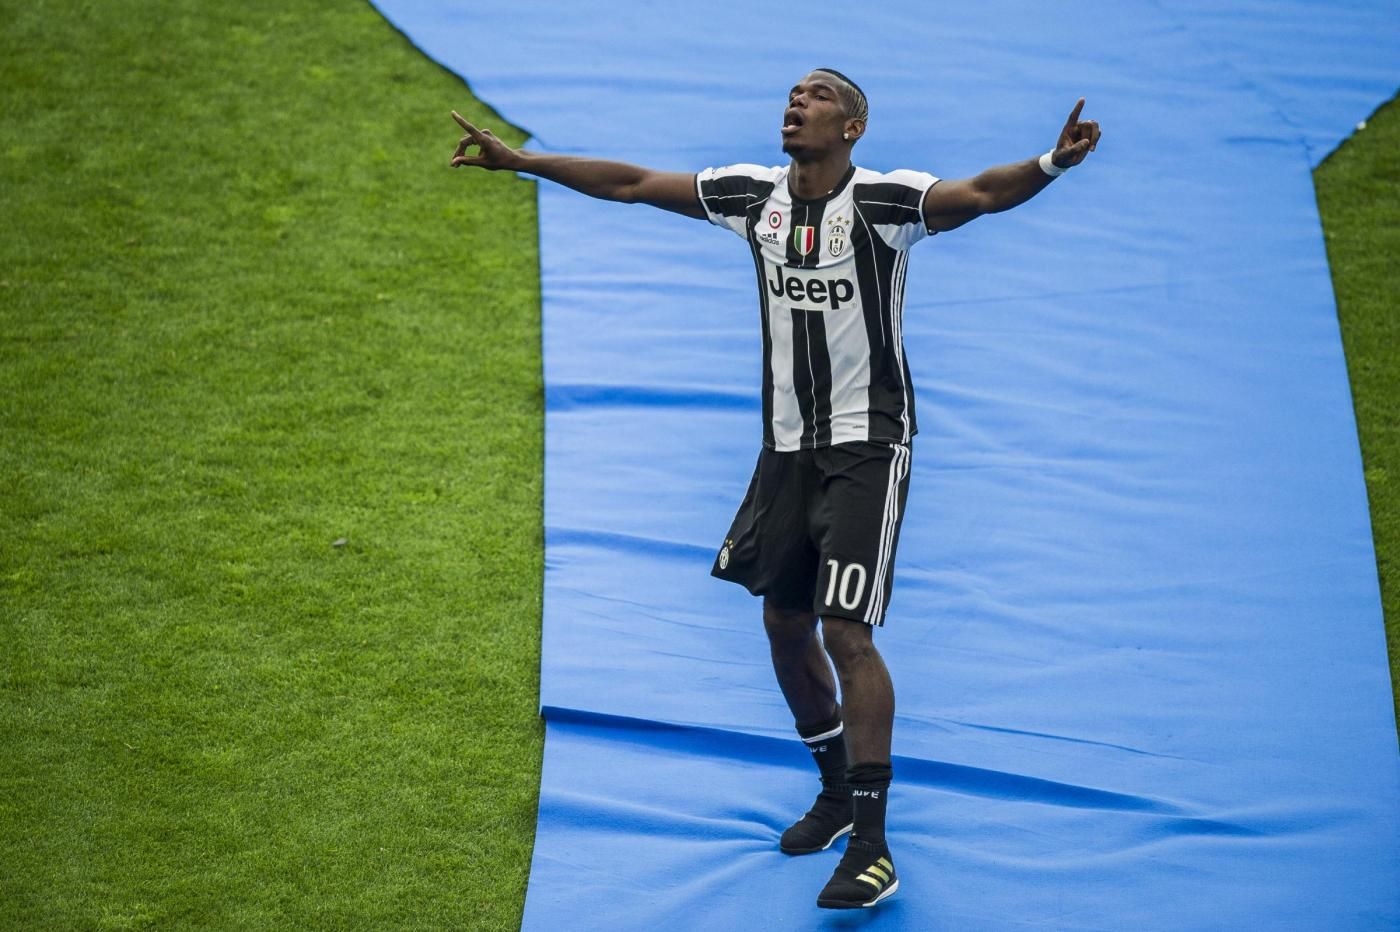 Juventus vs Sampdoria La Premiazione